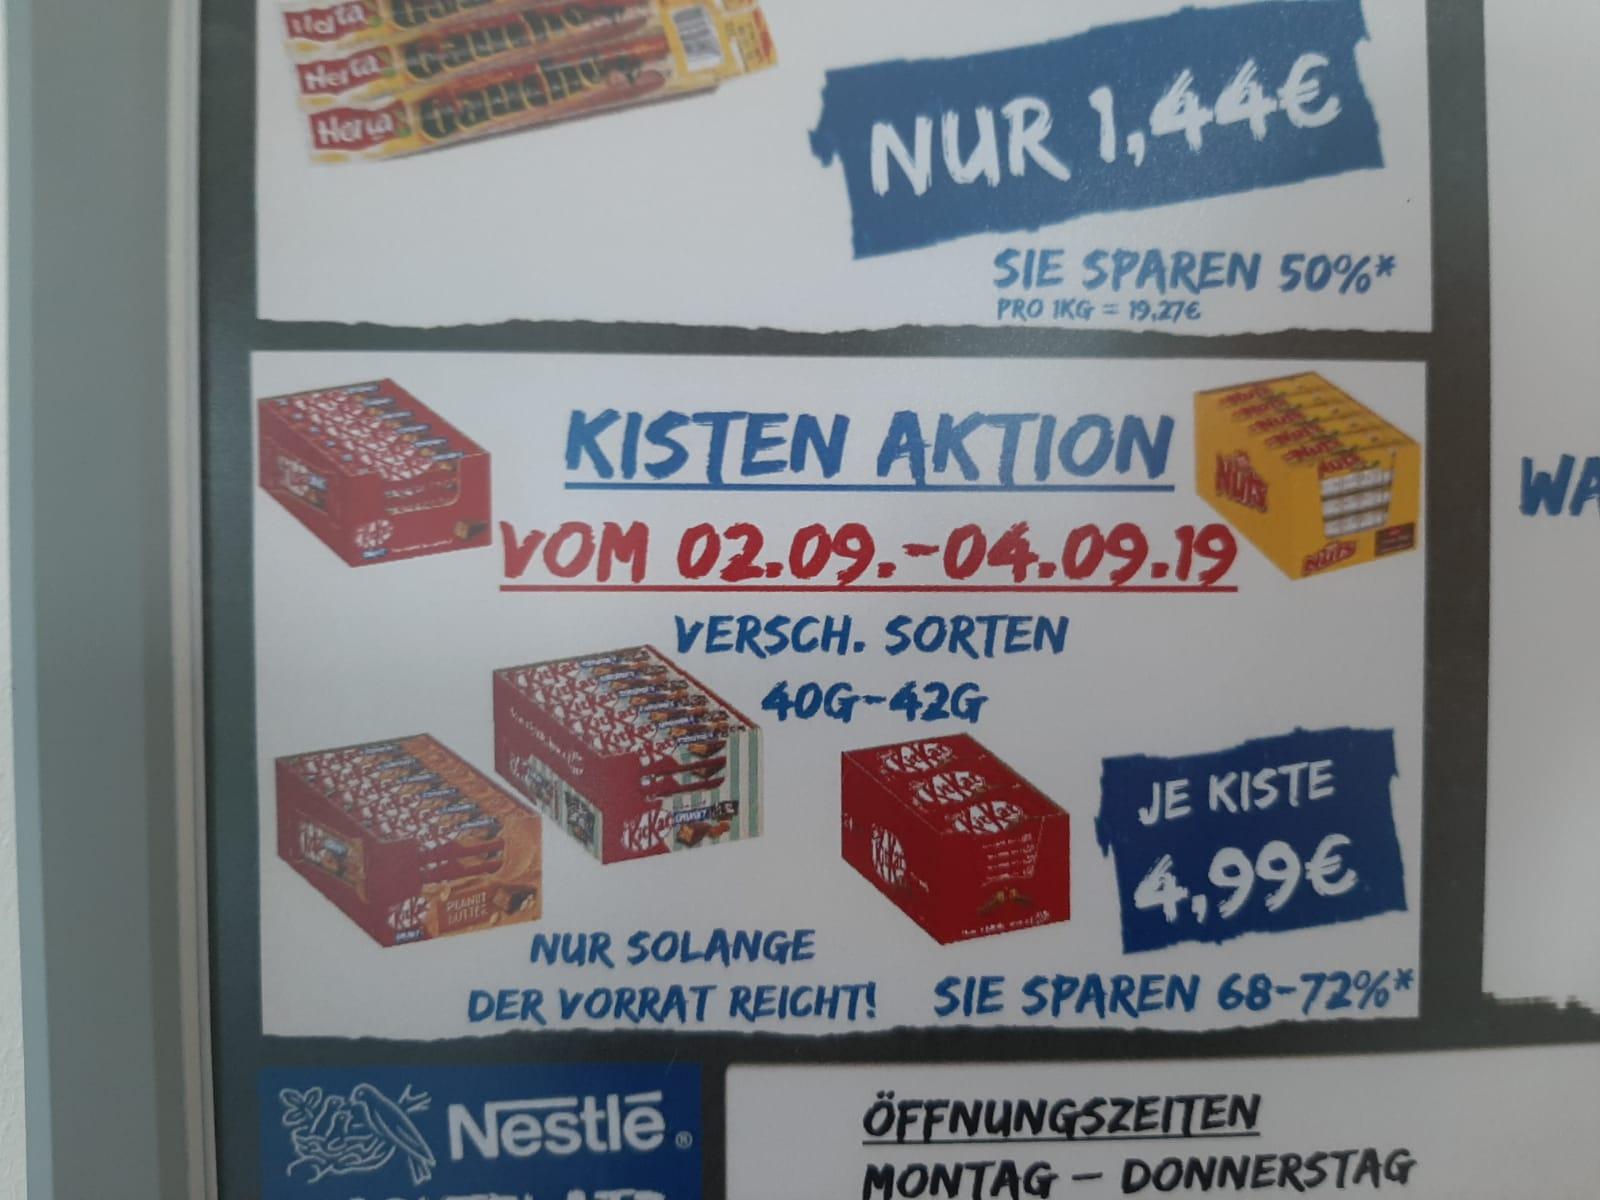 [Lokal Frankfurt am Main Nestle] Kisten Aktion: Verschiedene Sorten KitKat